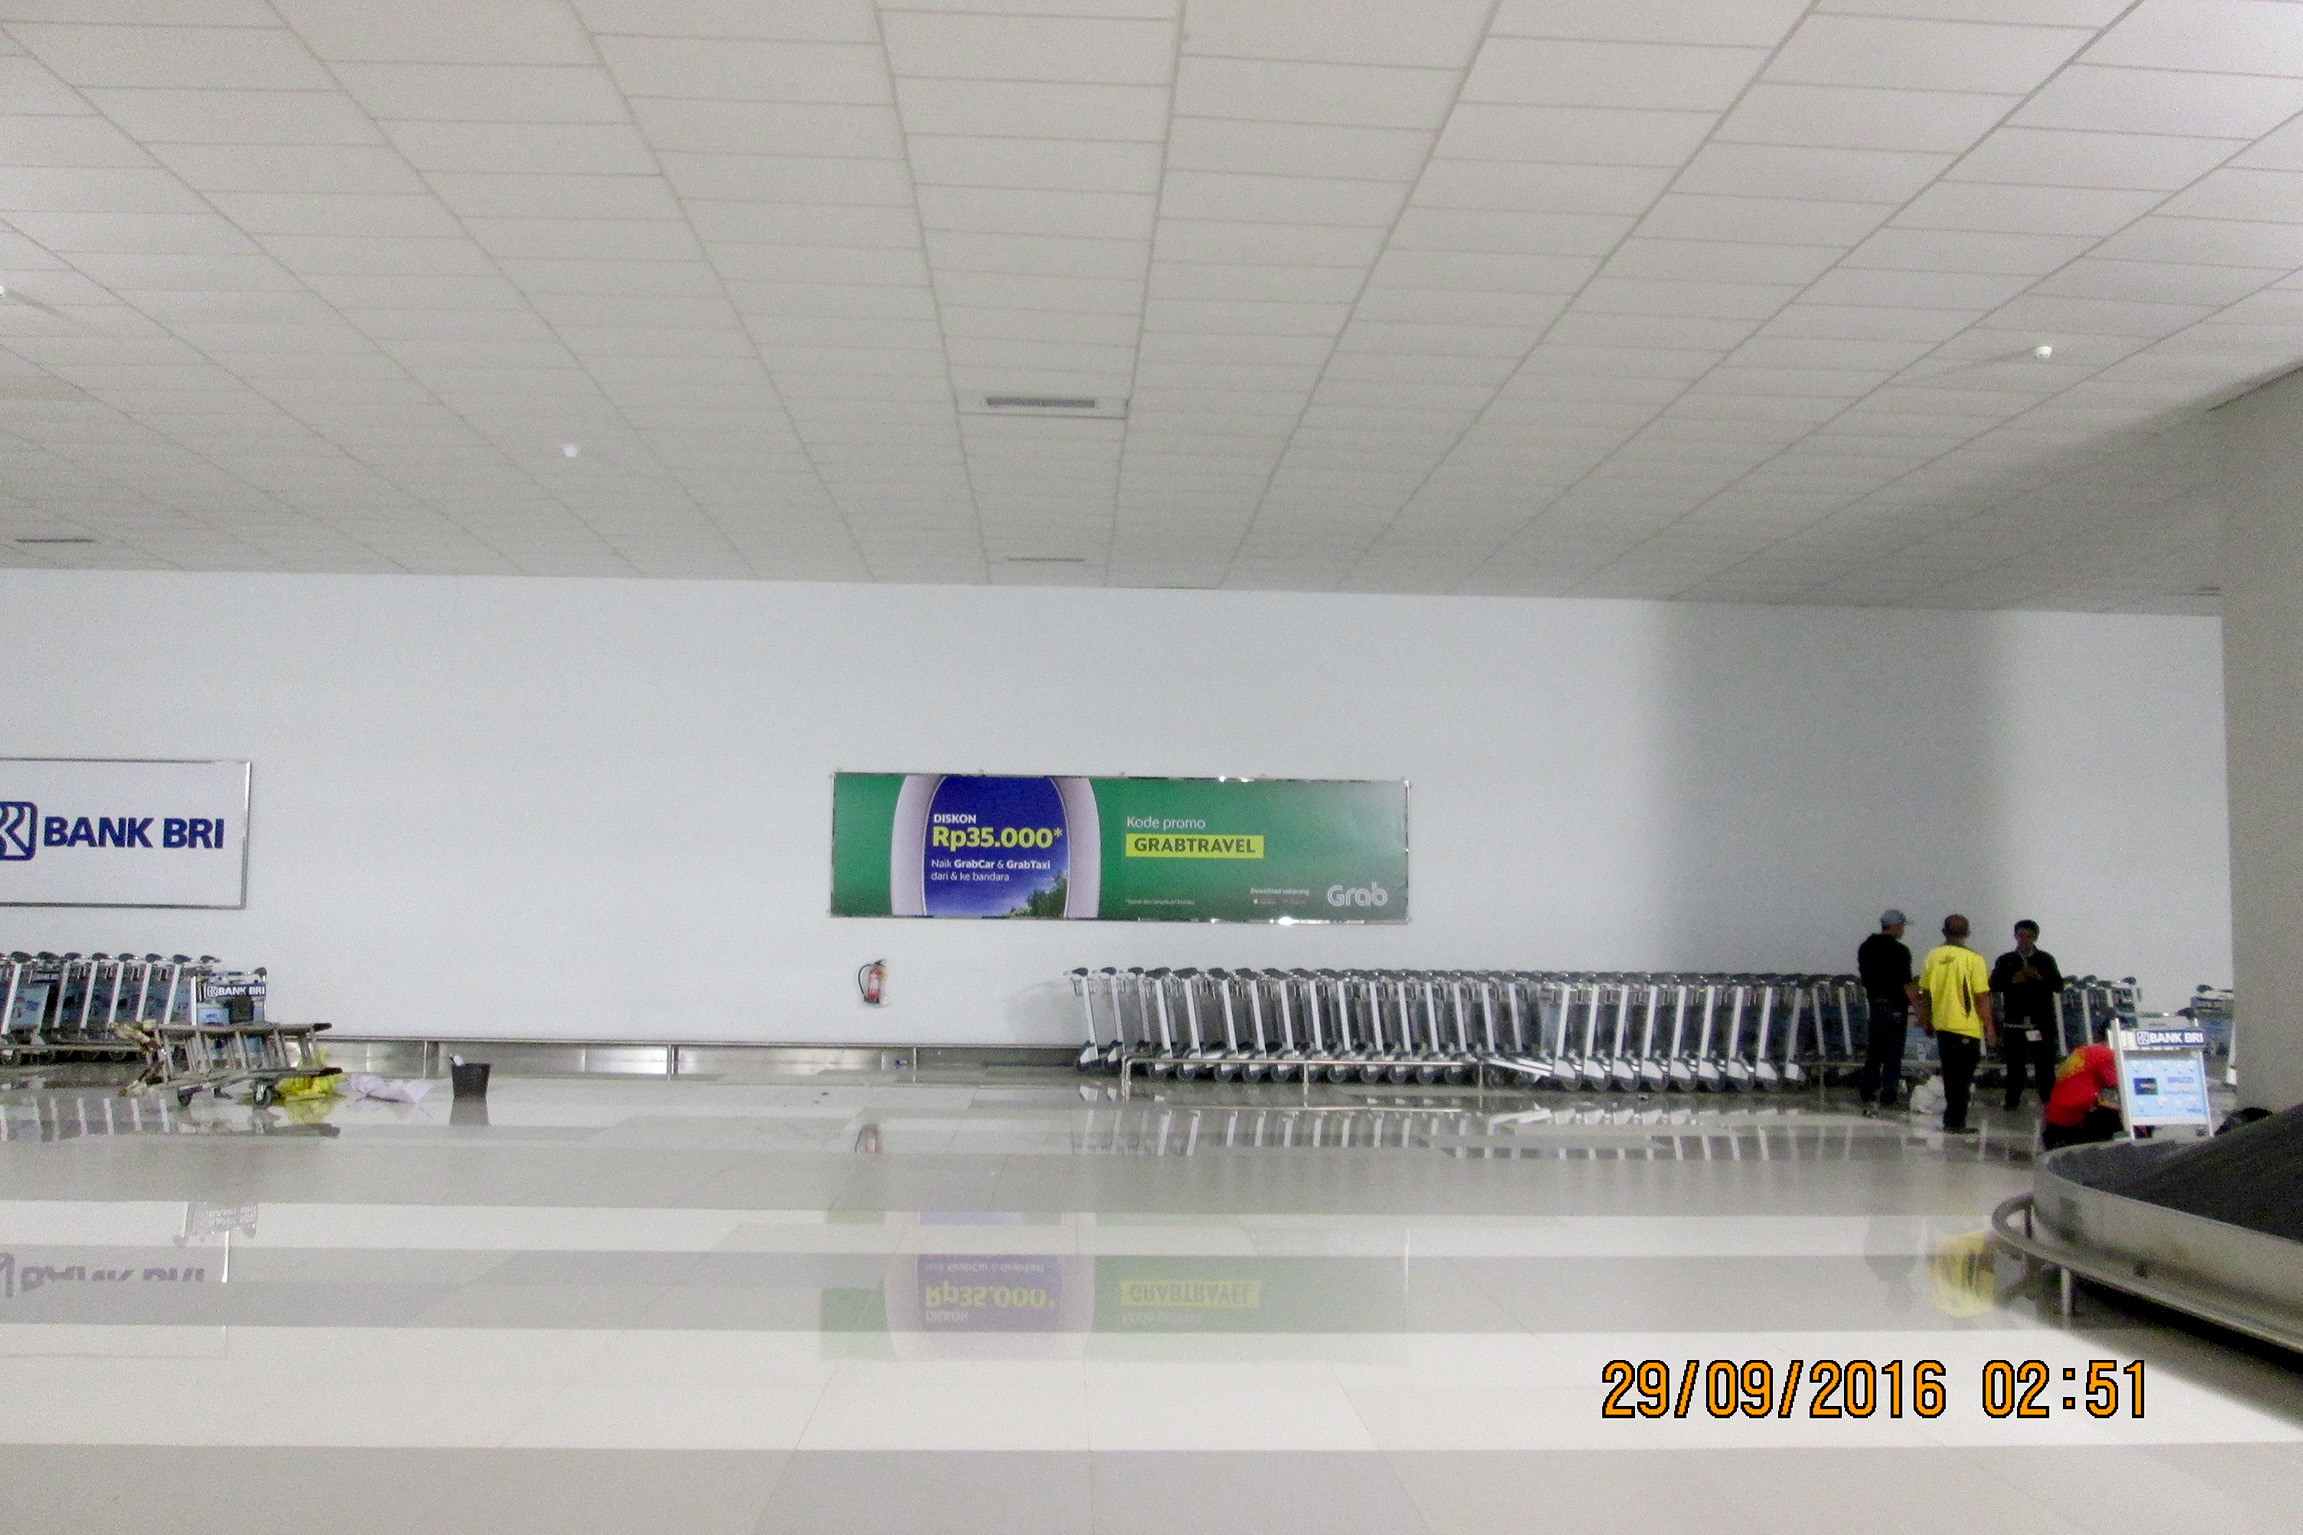 Grab - Soekarno Hatta International Airport Jakarta T3 Ultimate